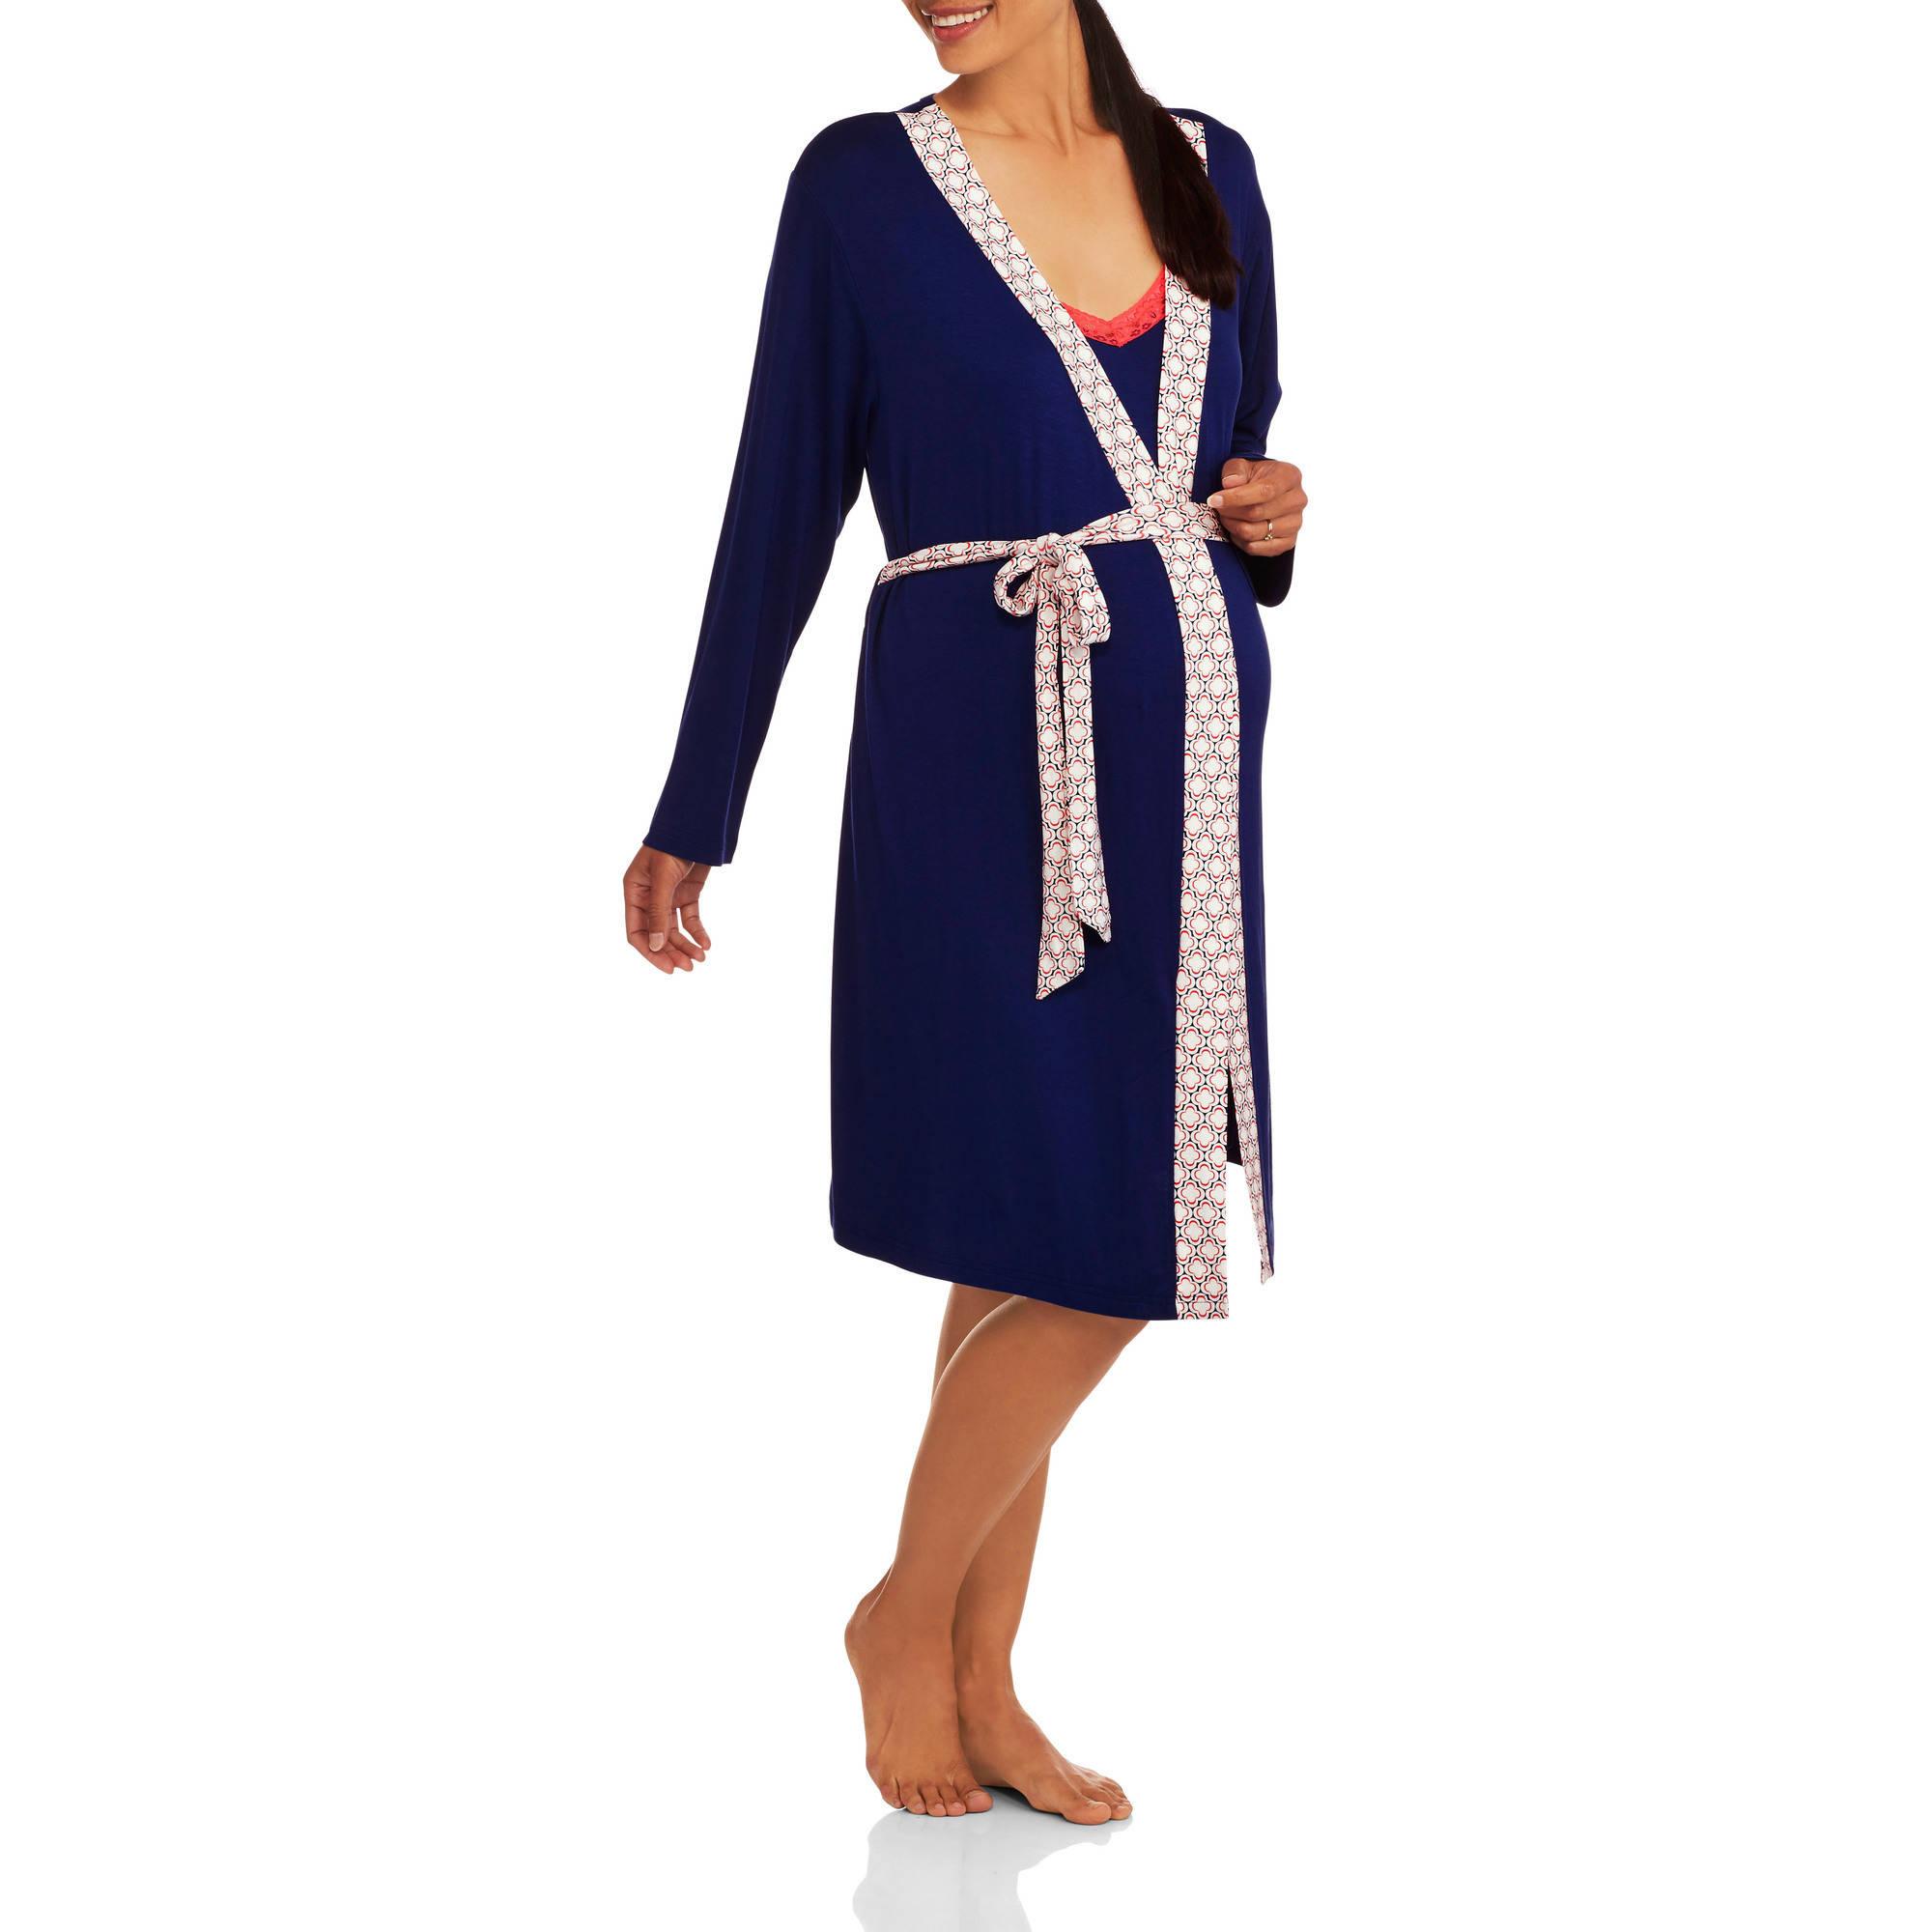 Nurture by Lamaze Maternity 2-Piece Nursing Chemise and Robe Set